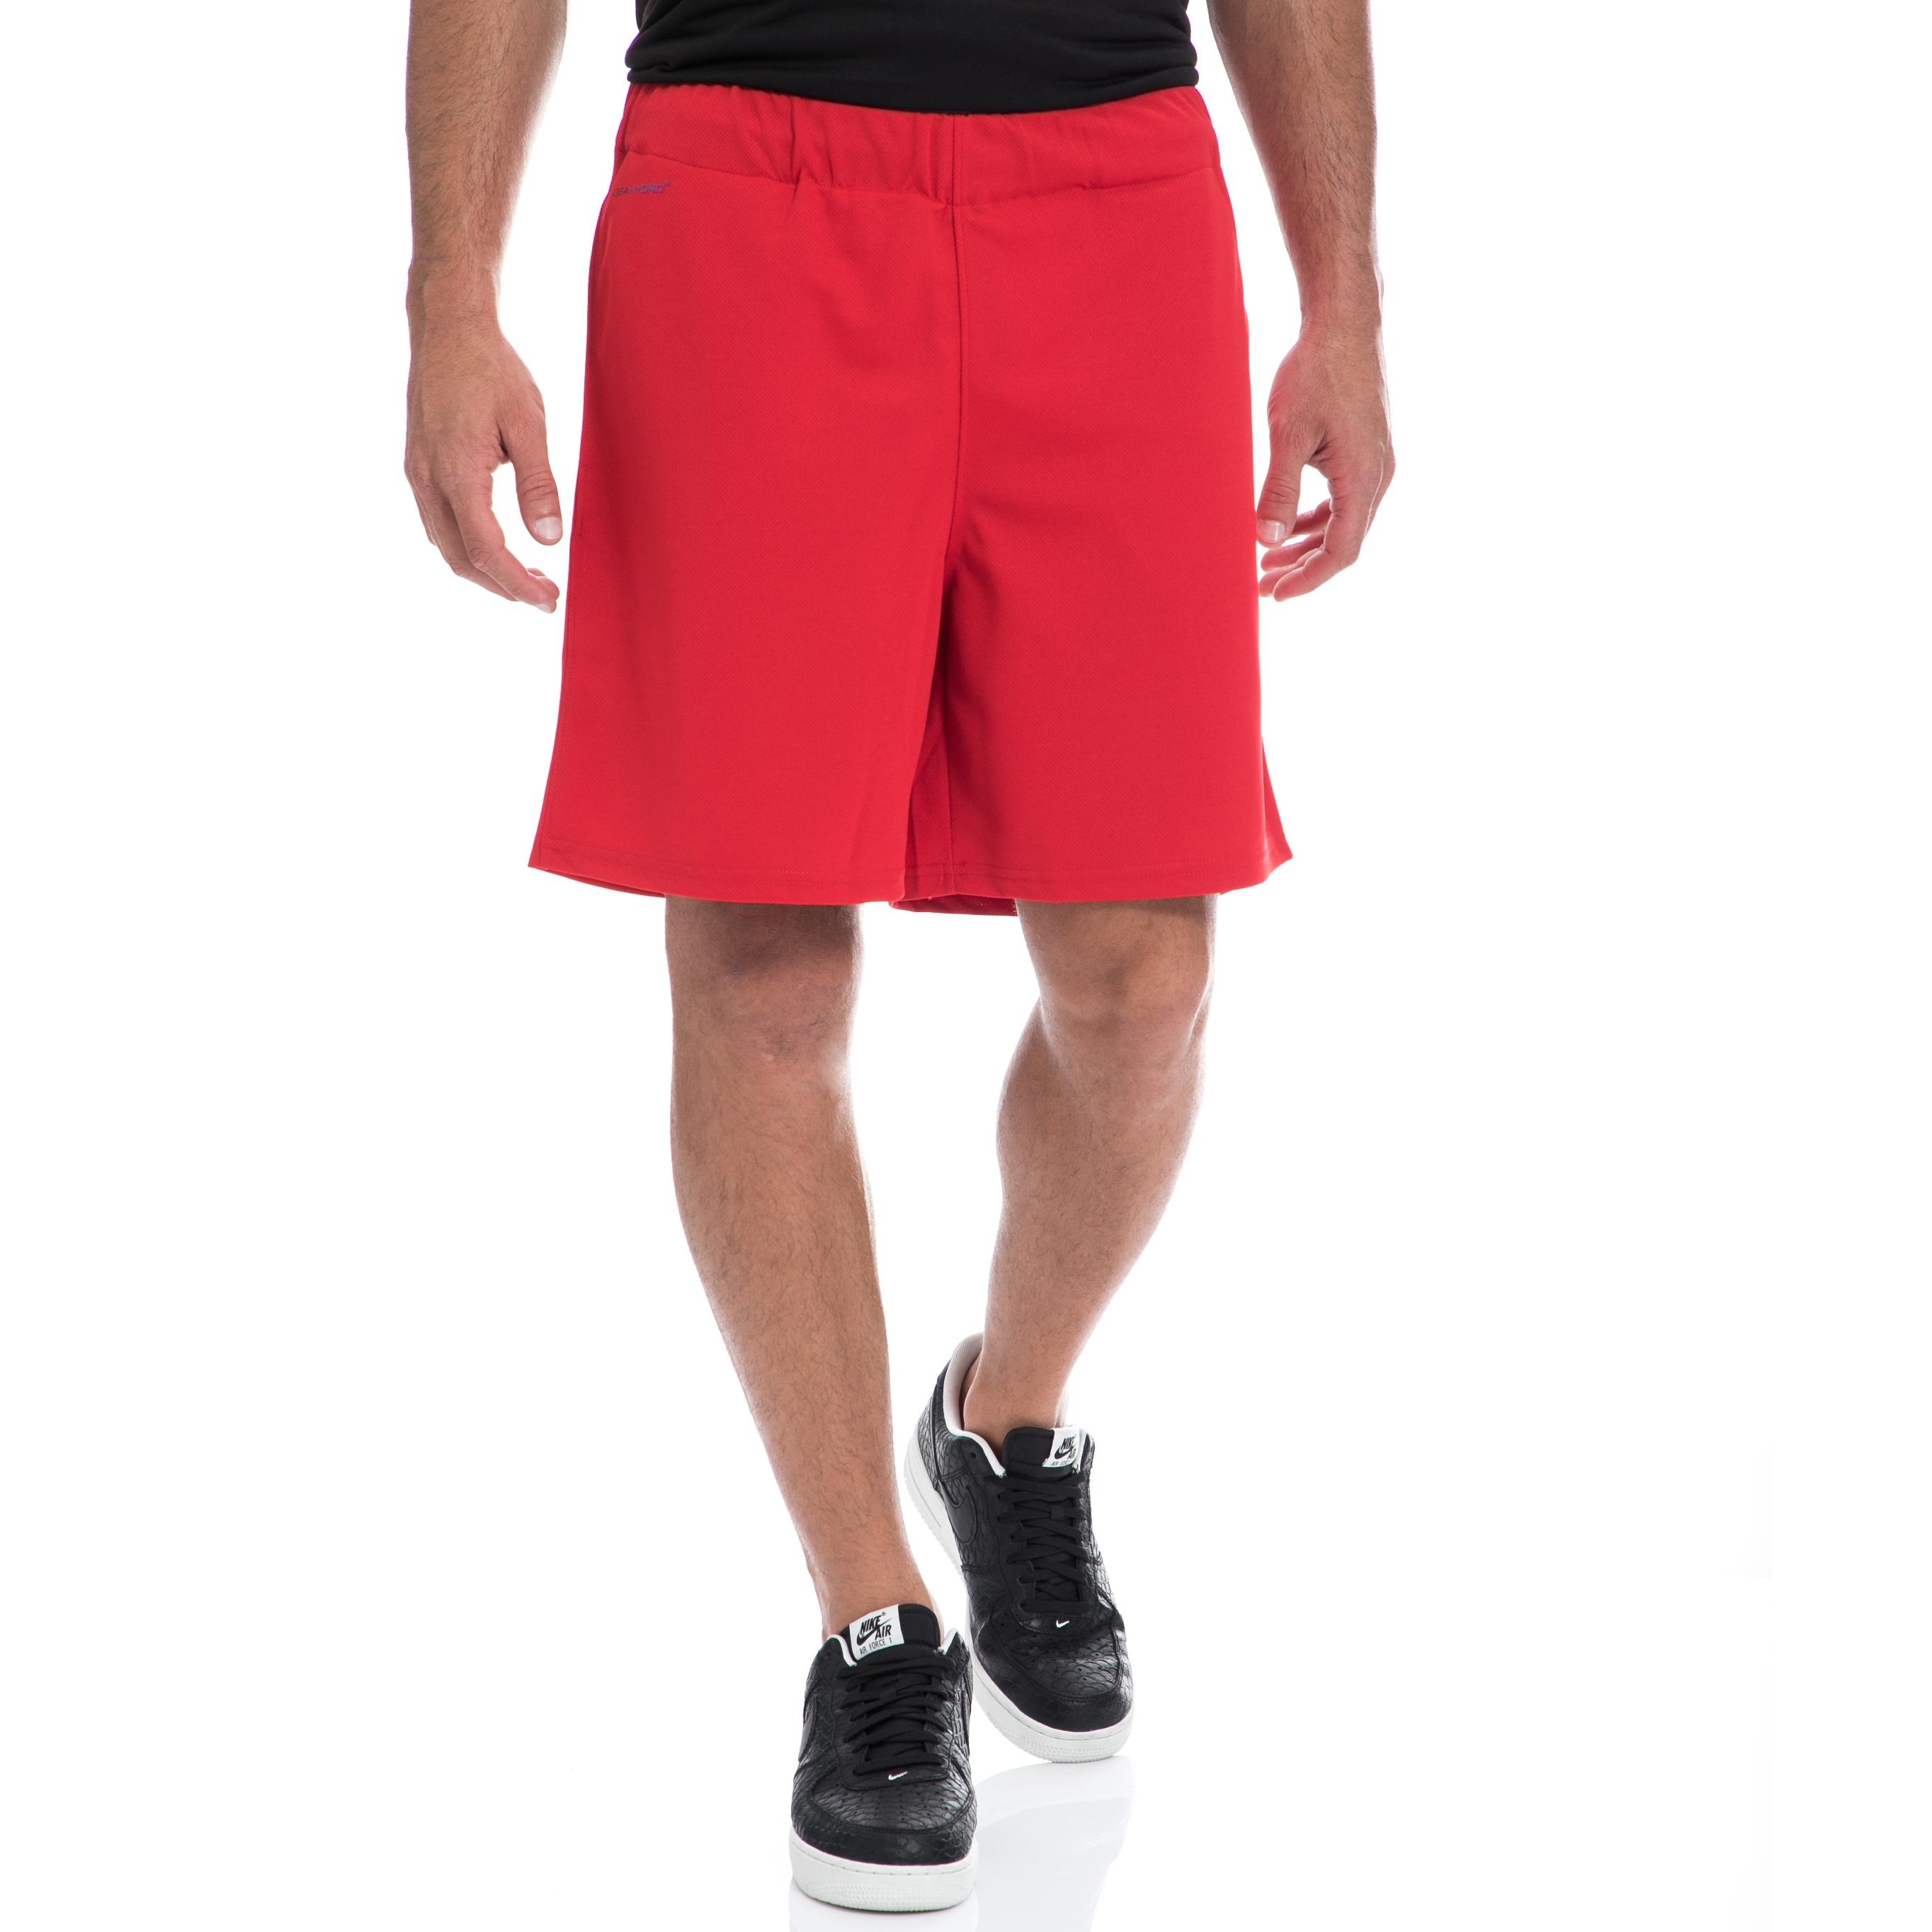 GSA - Αντρική βερμούδα GSA κόκκινη ανδρικά ρούχα σορτς βερμούδες αθλητικά